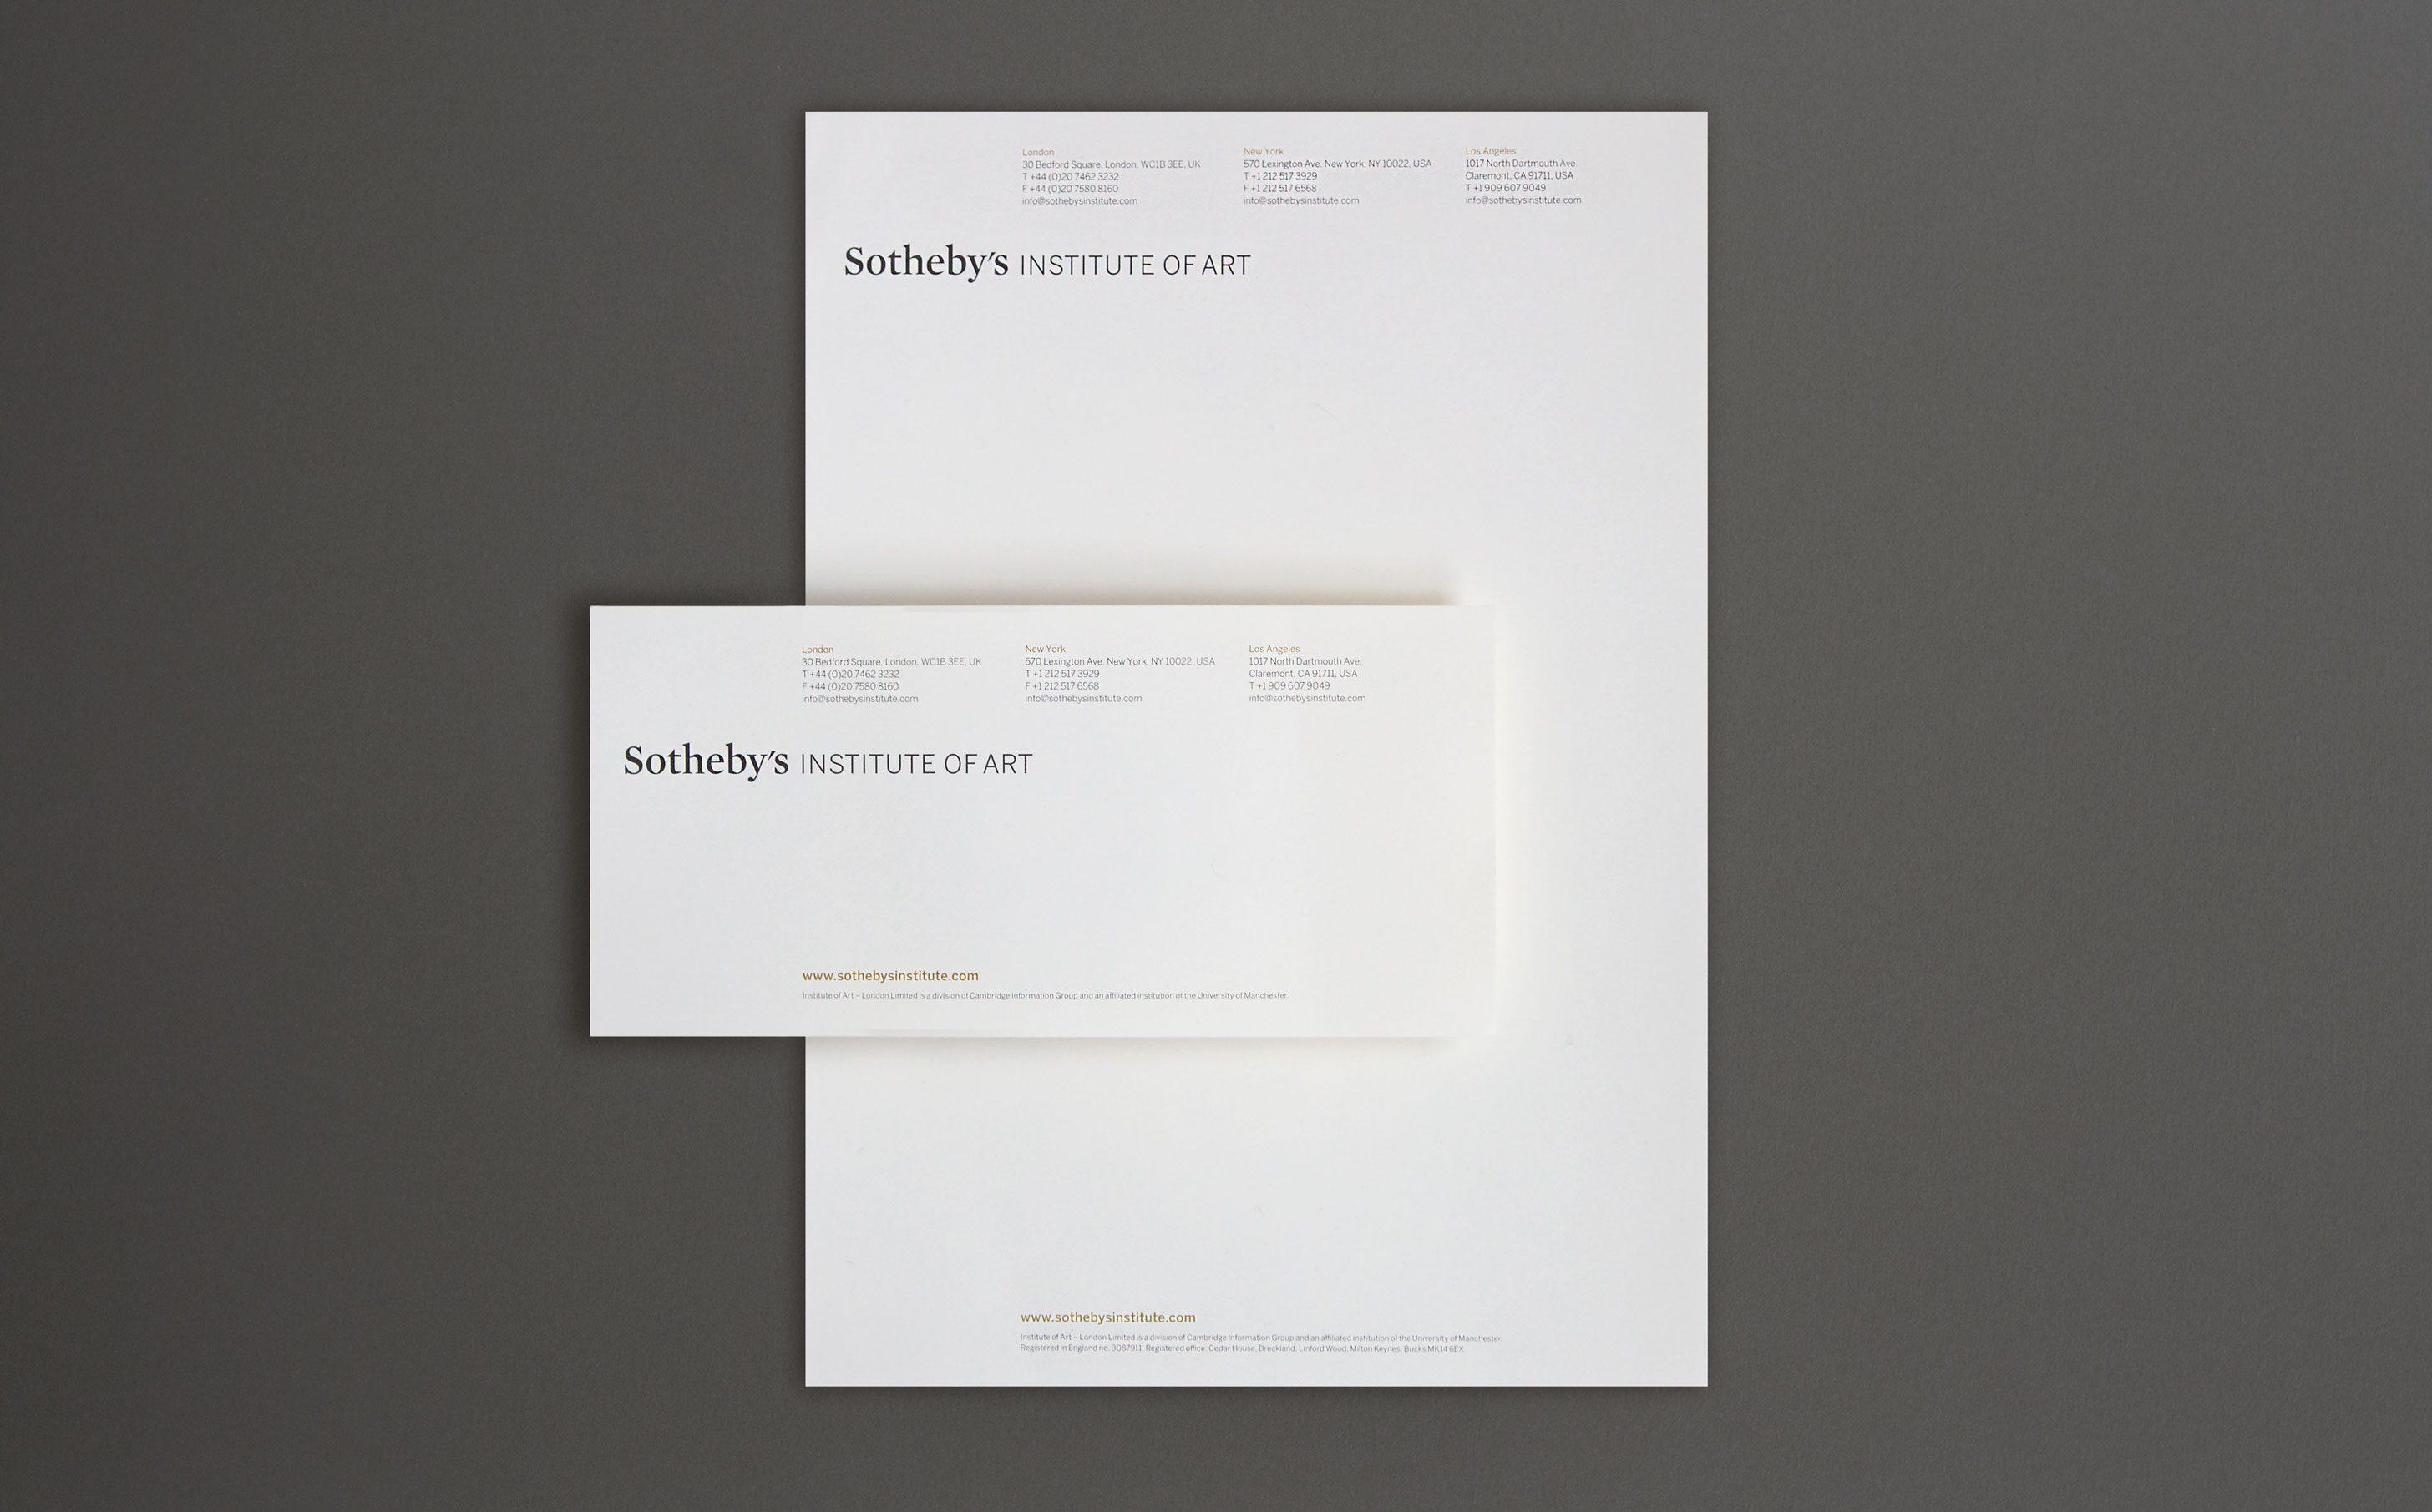 sothebys-stationery-design-01